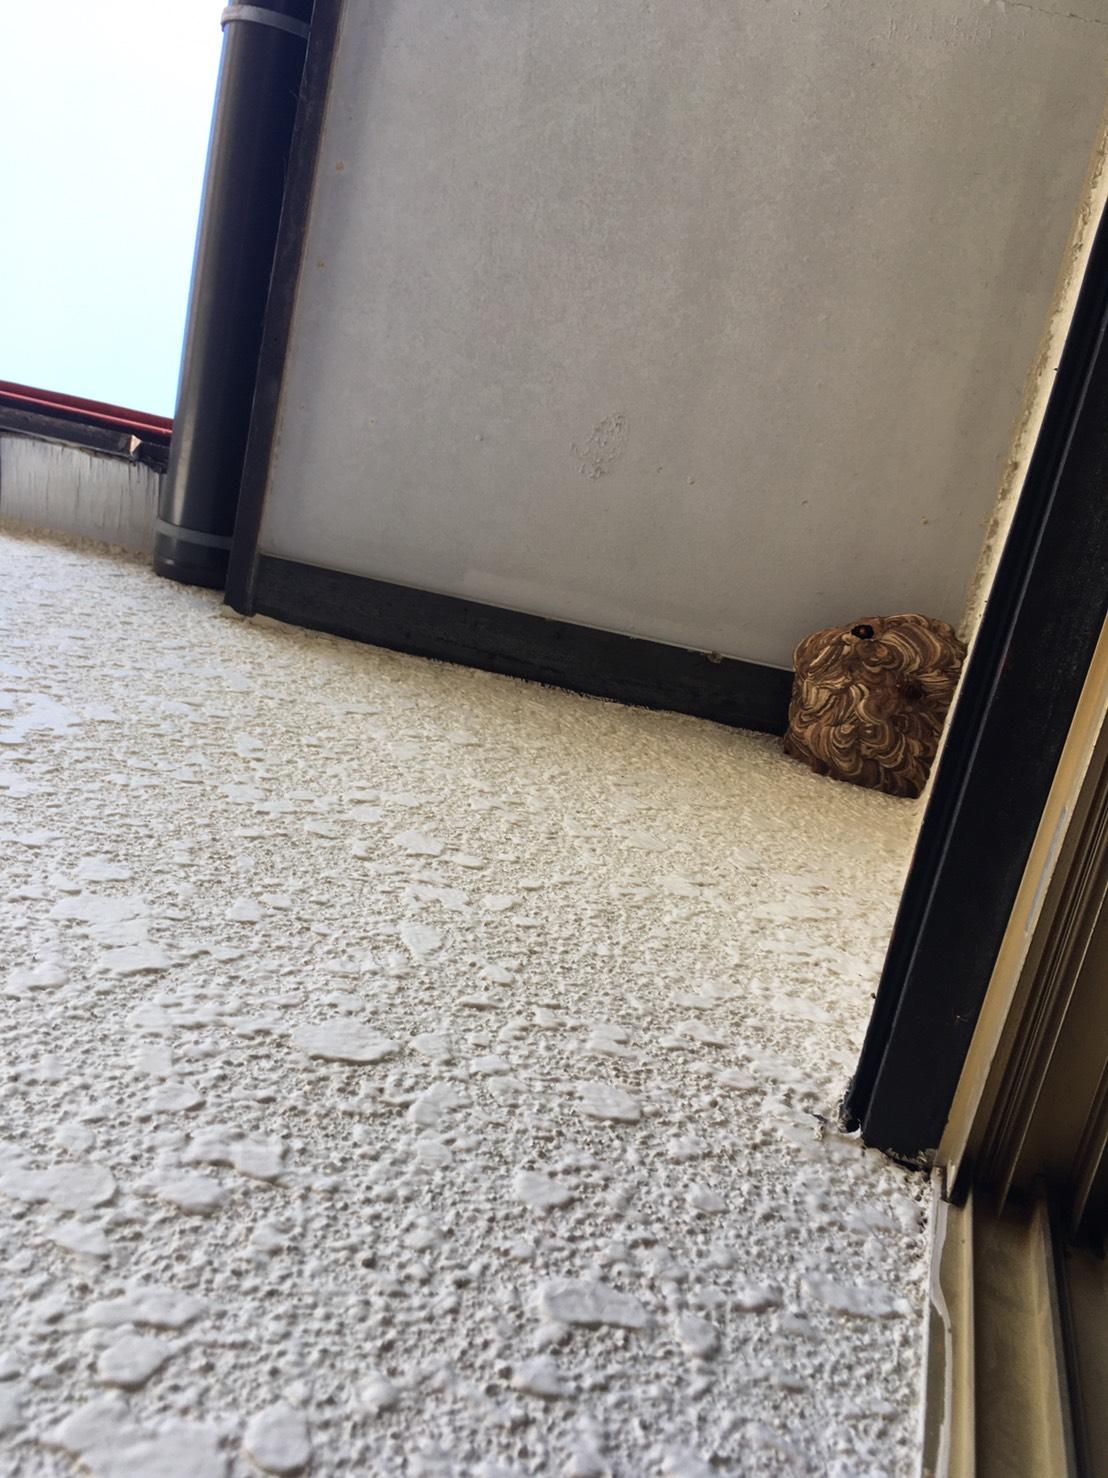 千葉県我孫子市久寺家の蜂の巣駆除現場